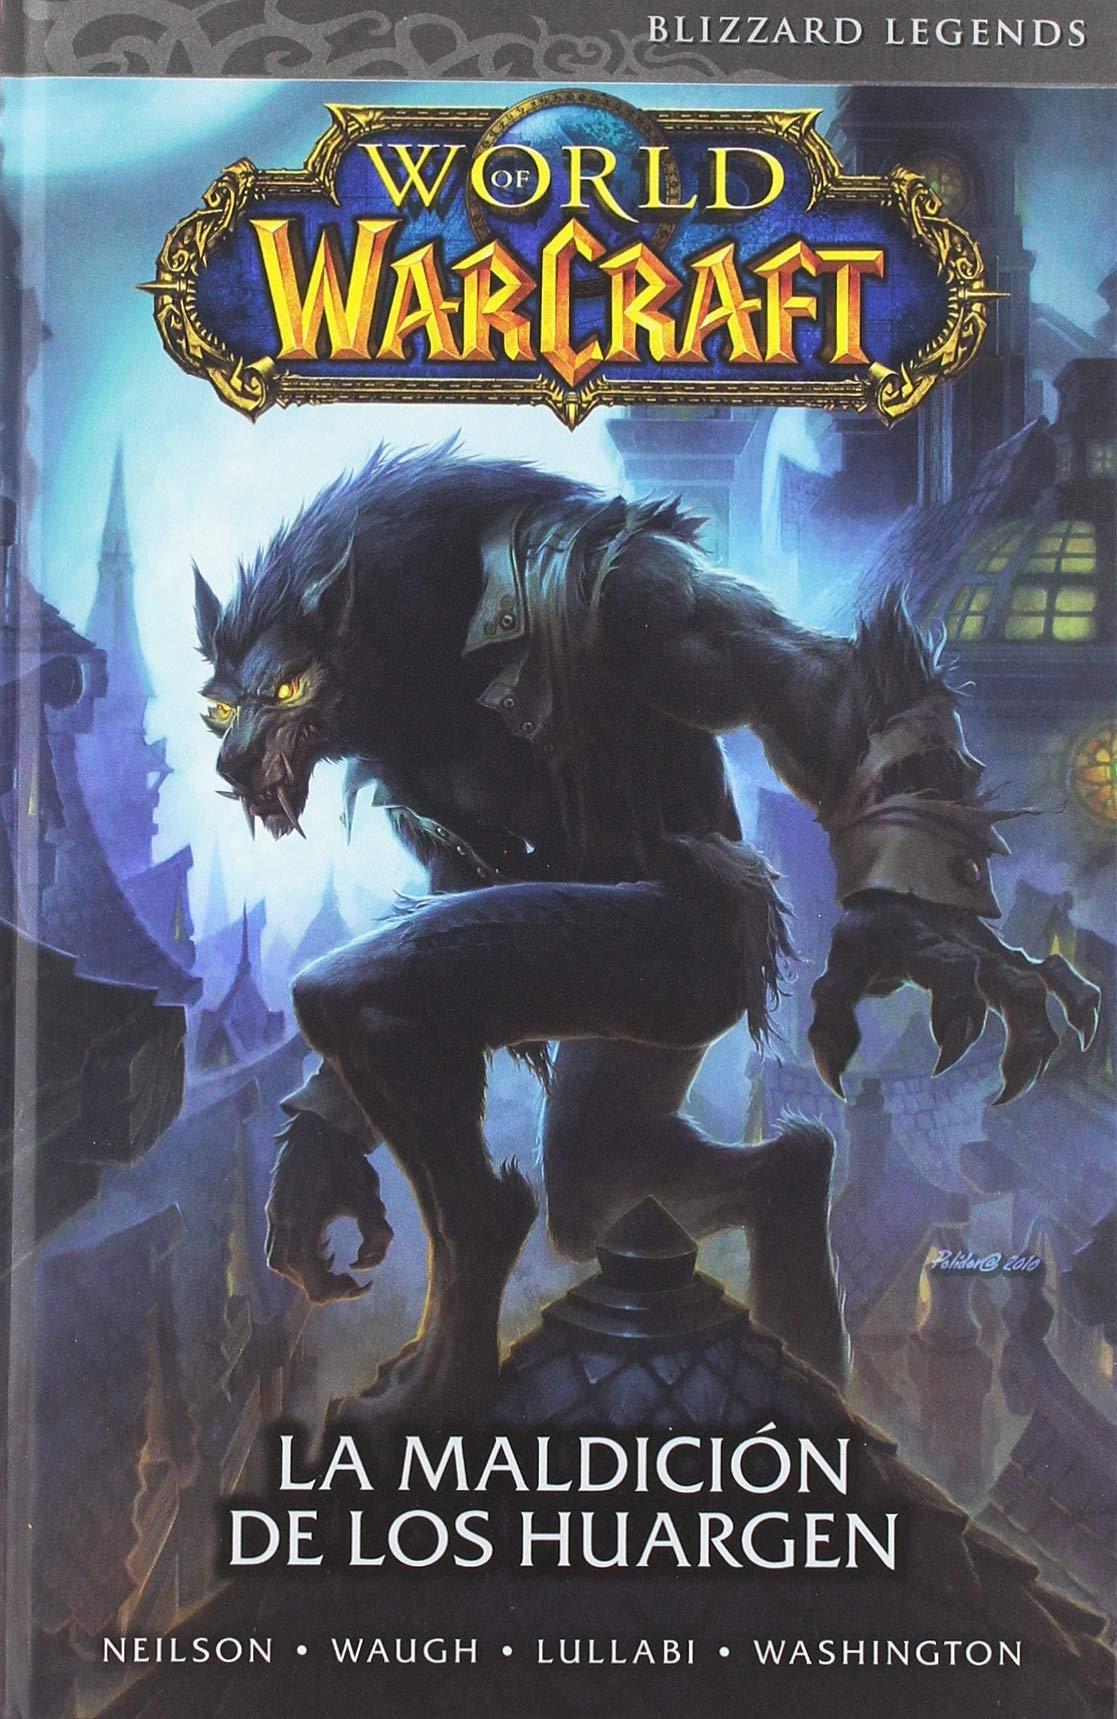 libros warcraft